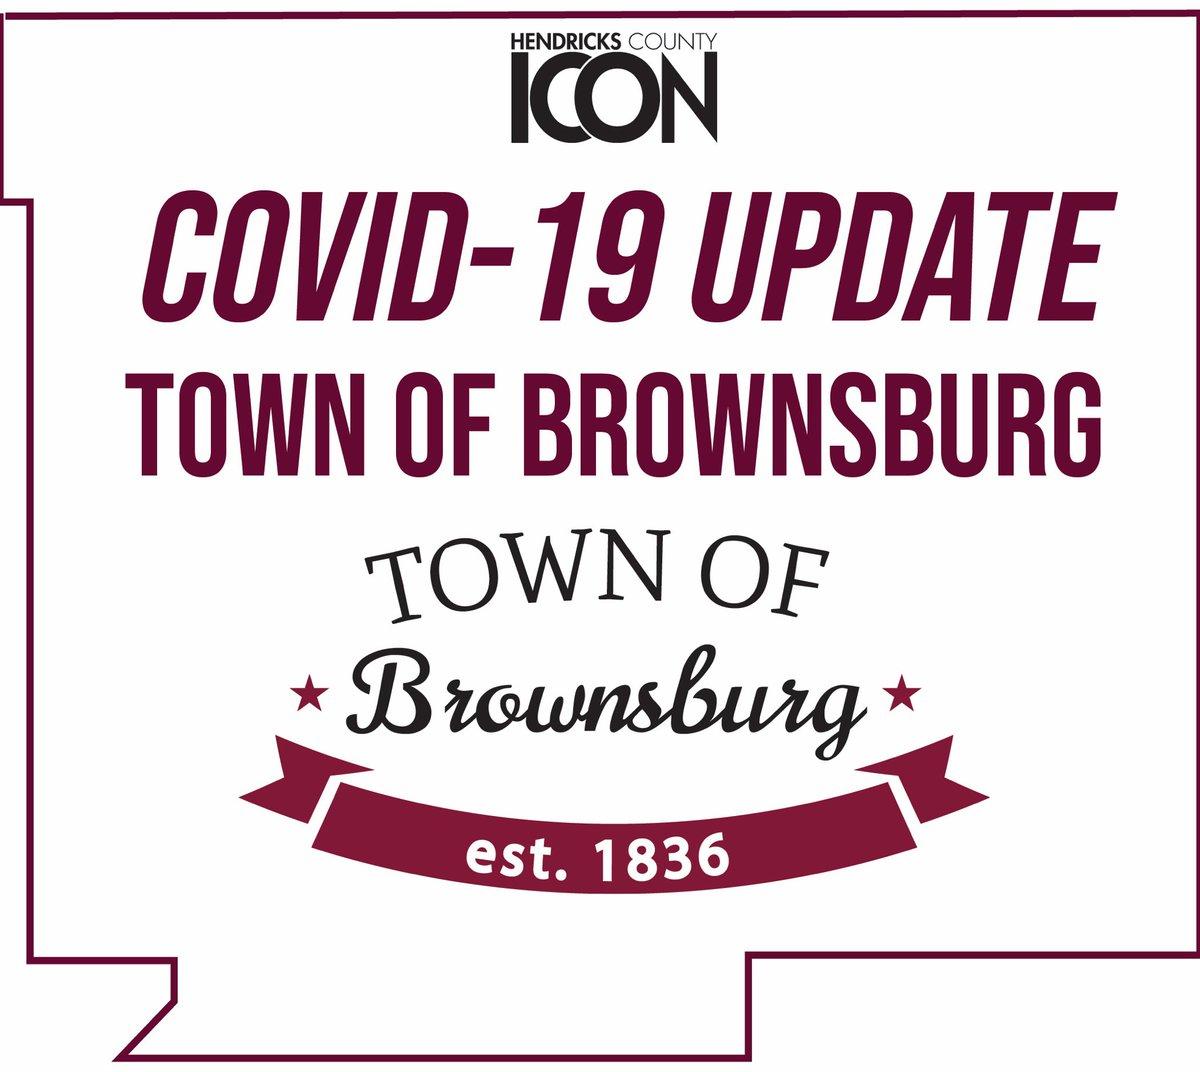 Town of Brownsburg @BrownsburgIN launches grant program to help small businesses prep for reopen  #COVID19 #BrownsburgIN #SmallBusiness #Grants #ALLinHendricks #inHendricks   https://t.co/S6EC7XSgA9 https://t.co/oOyXCm4YFh